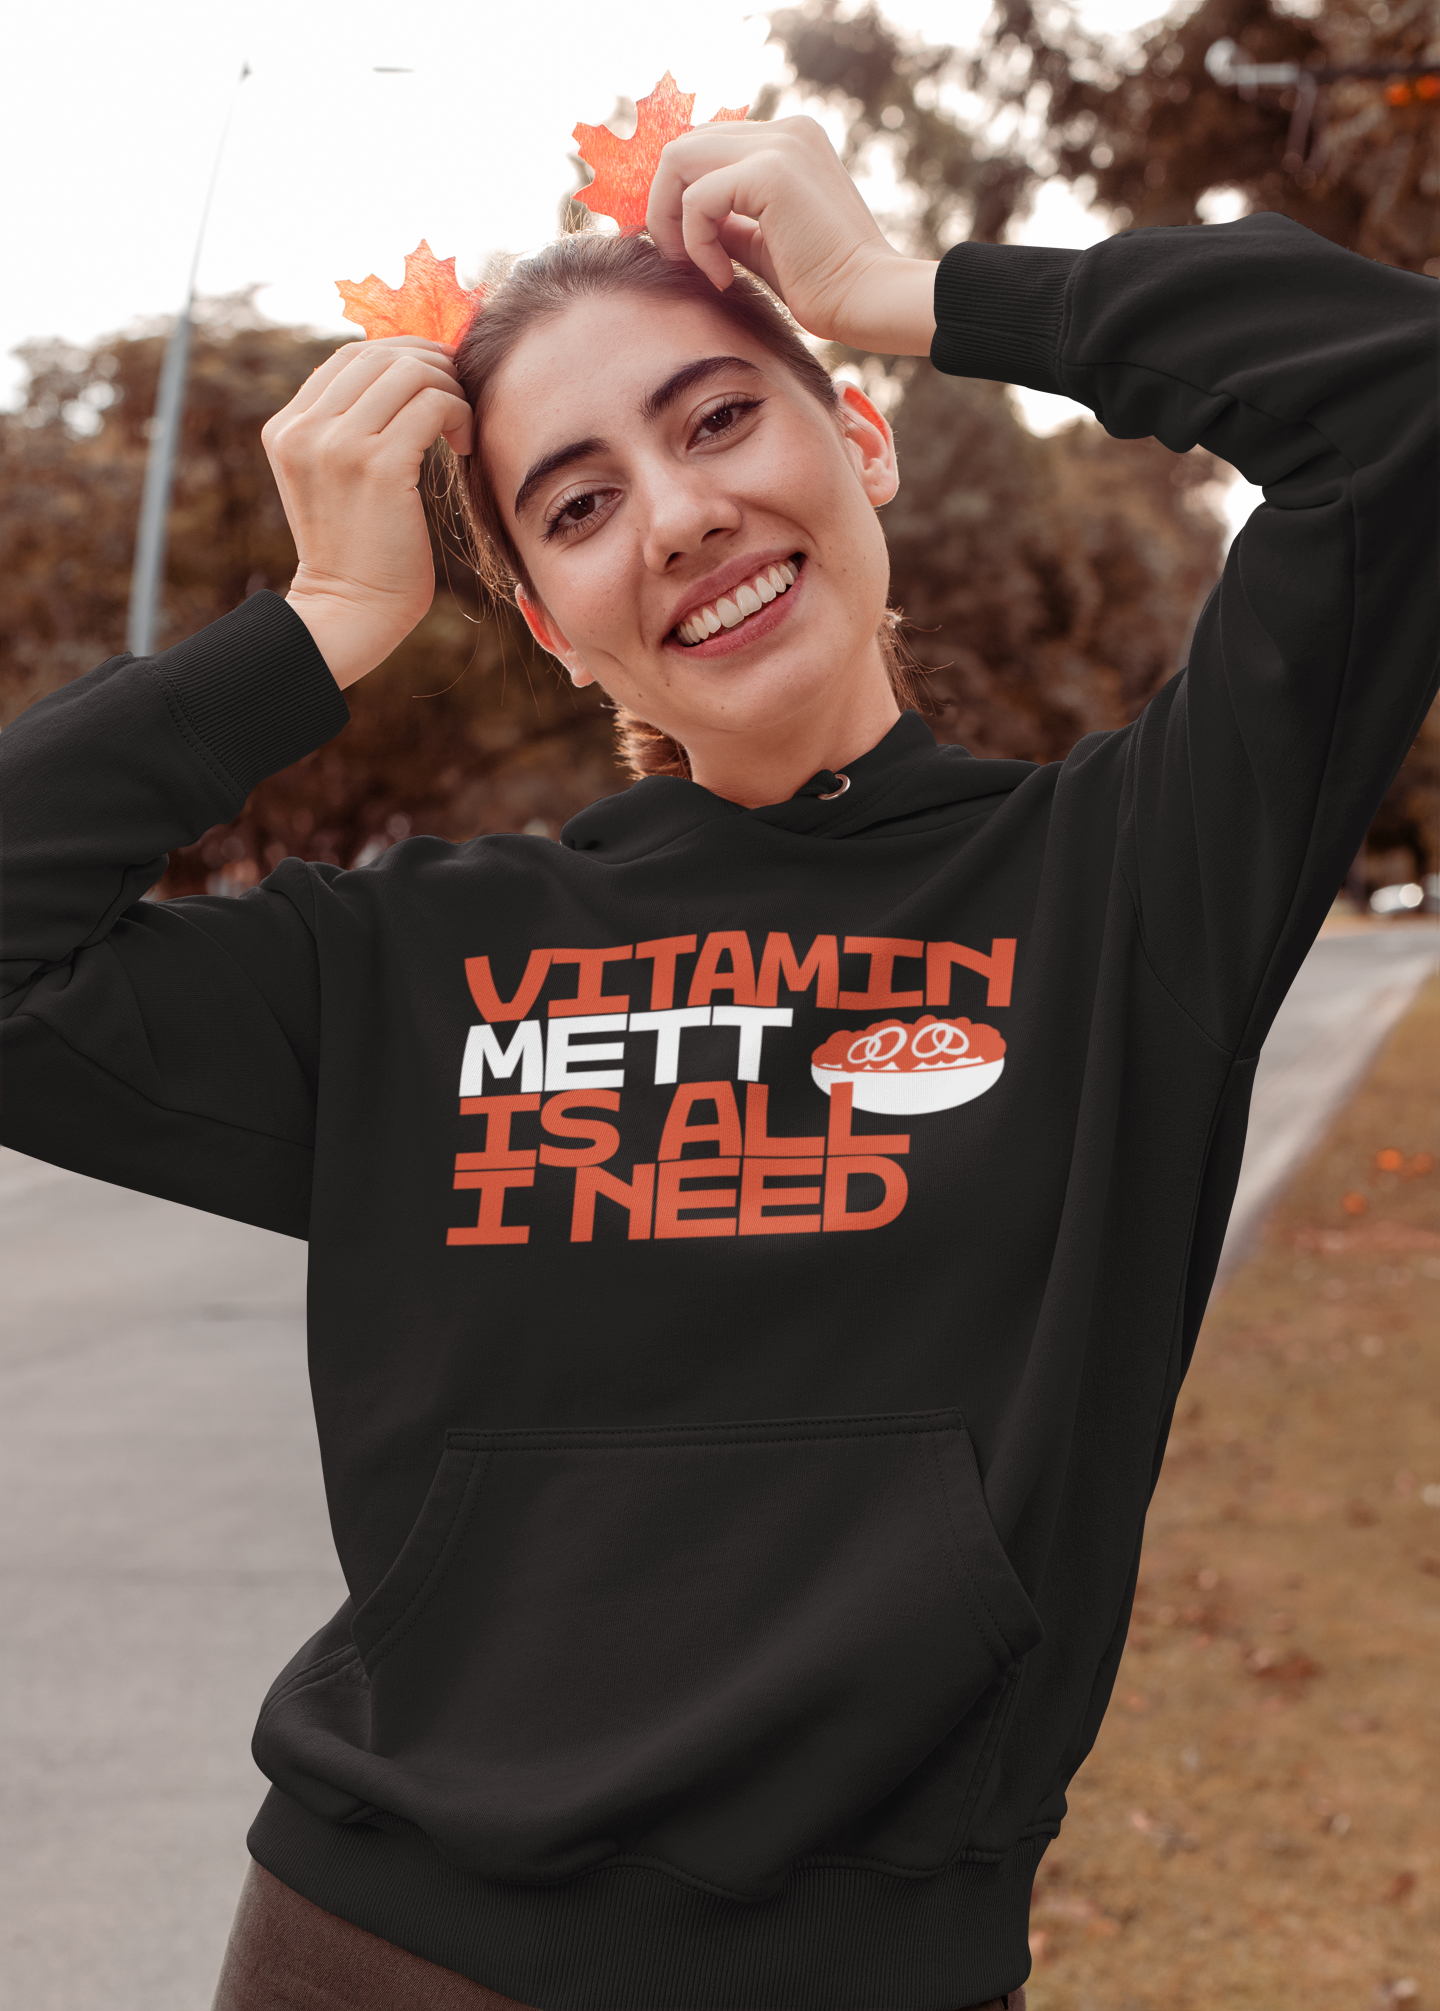 Vitamin Mett is all I need - Frauen Mett Pulli